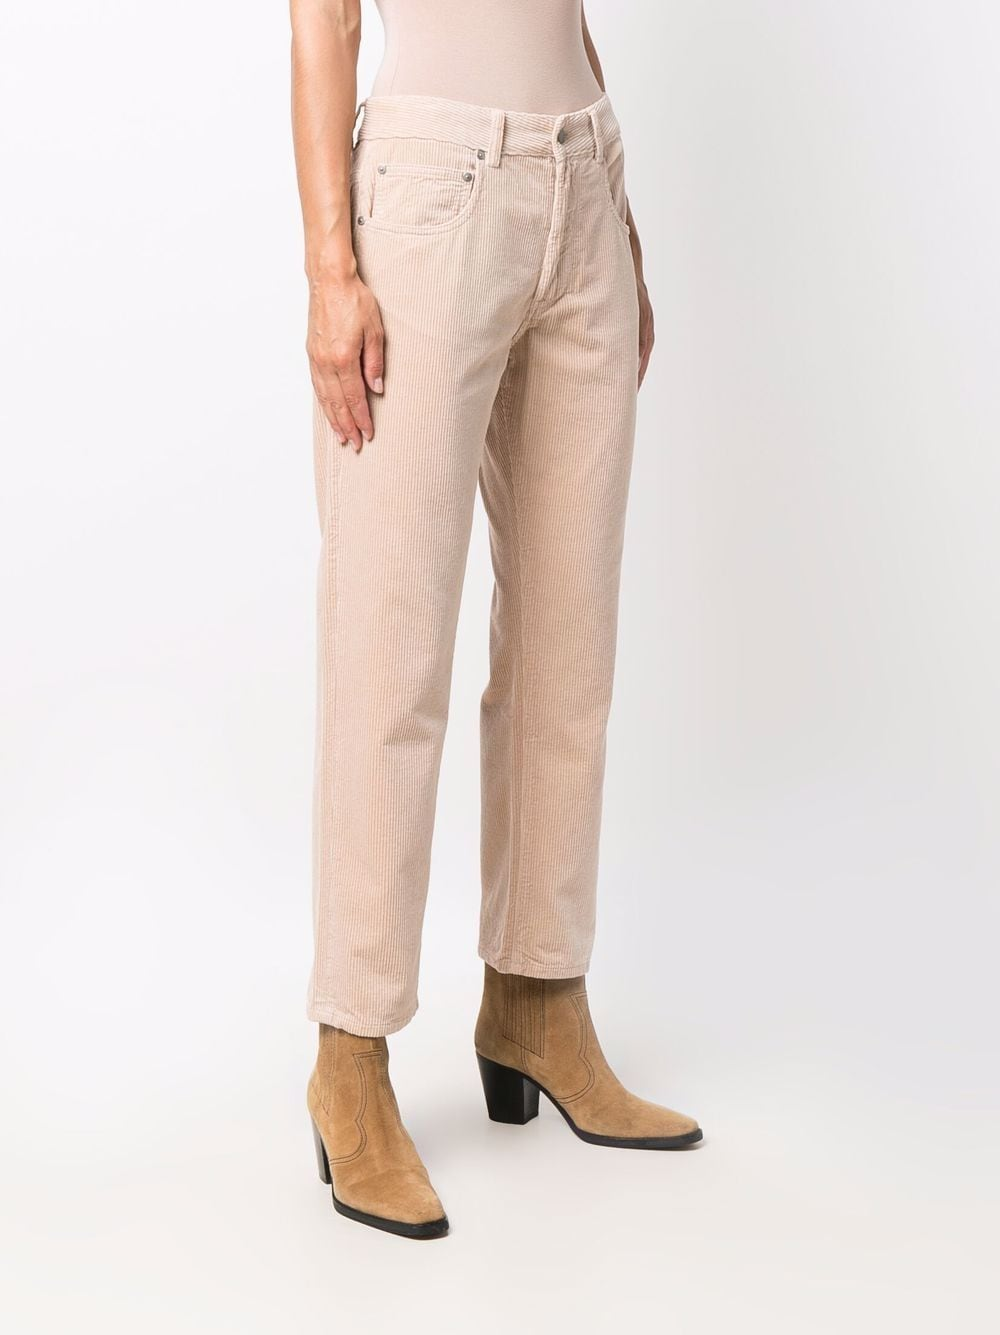 Beige cotton corduroy straight-leg trousers  ASPESI |  | 0180-E79285083